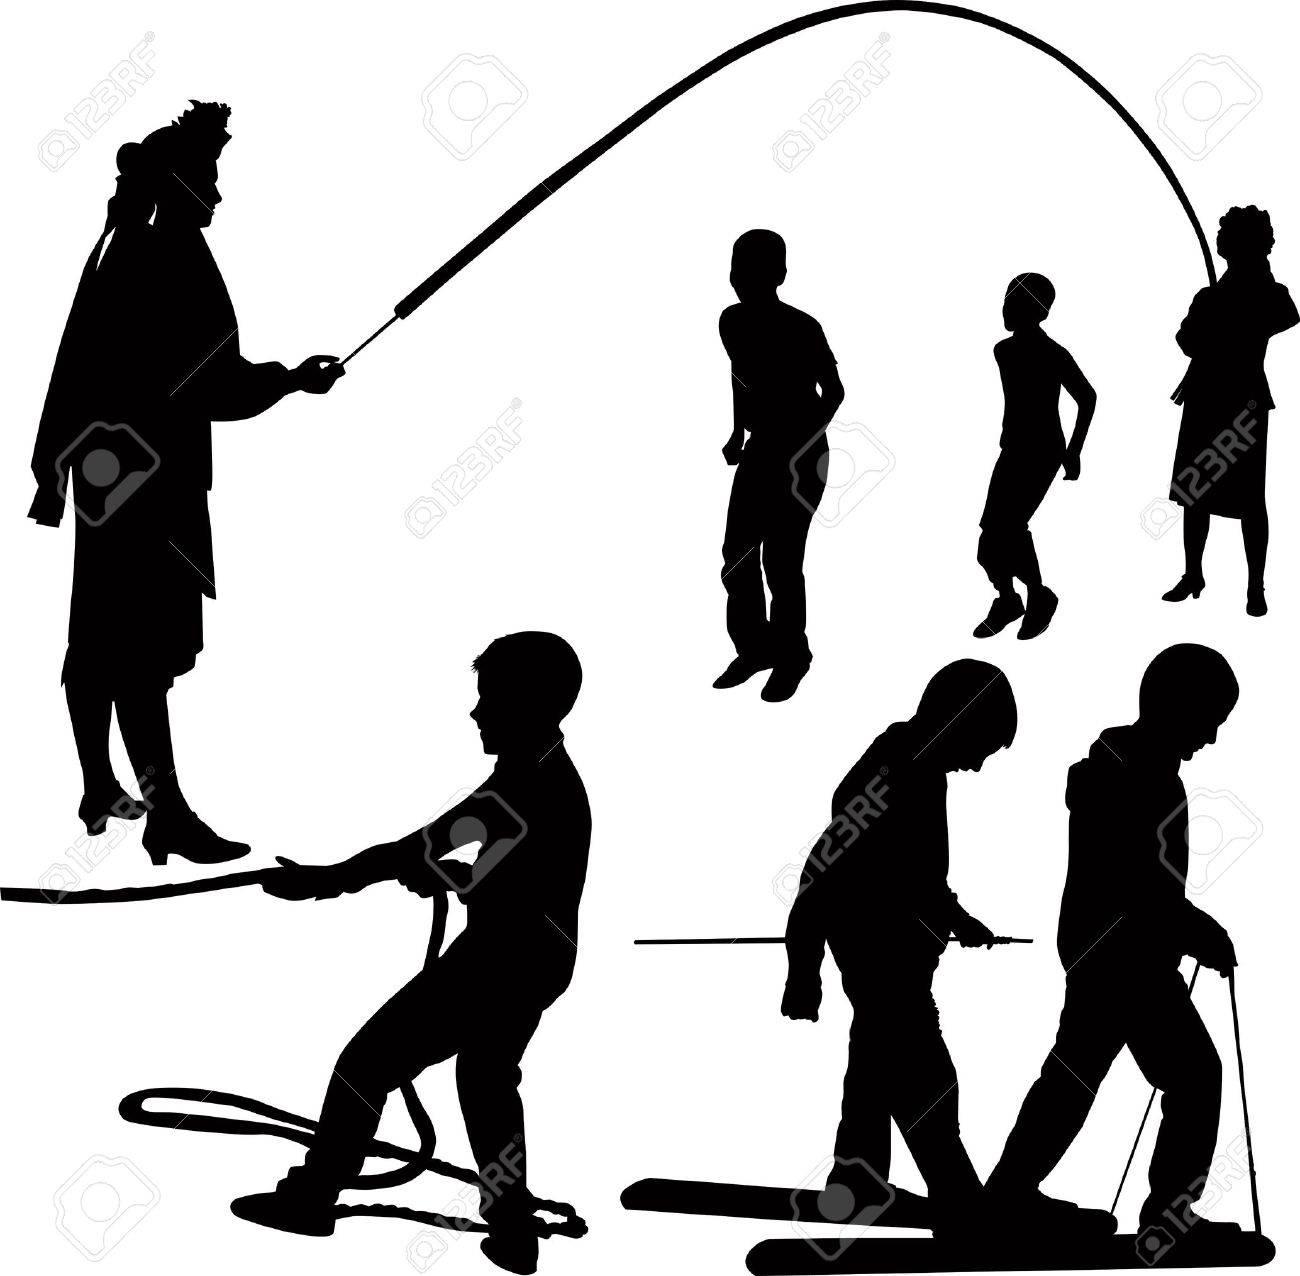 game of outdoor recreation Stock Vector - 17620499